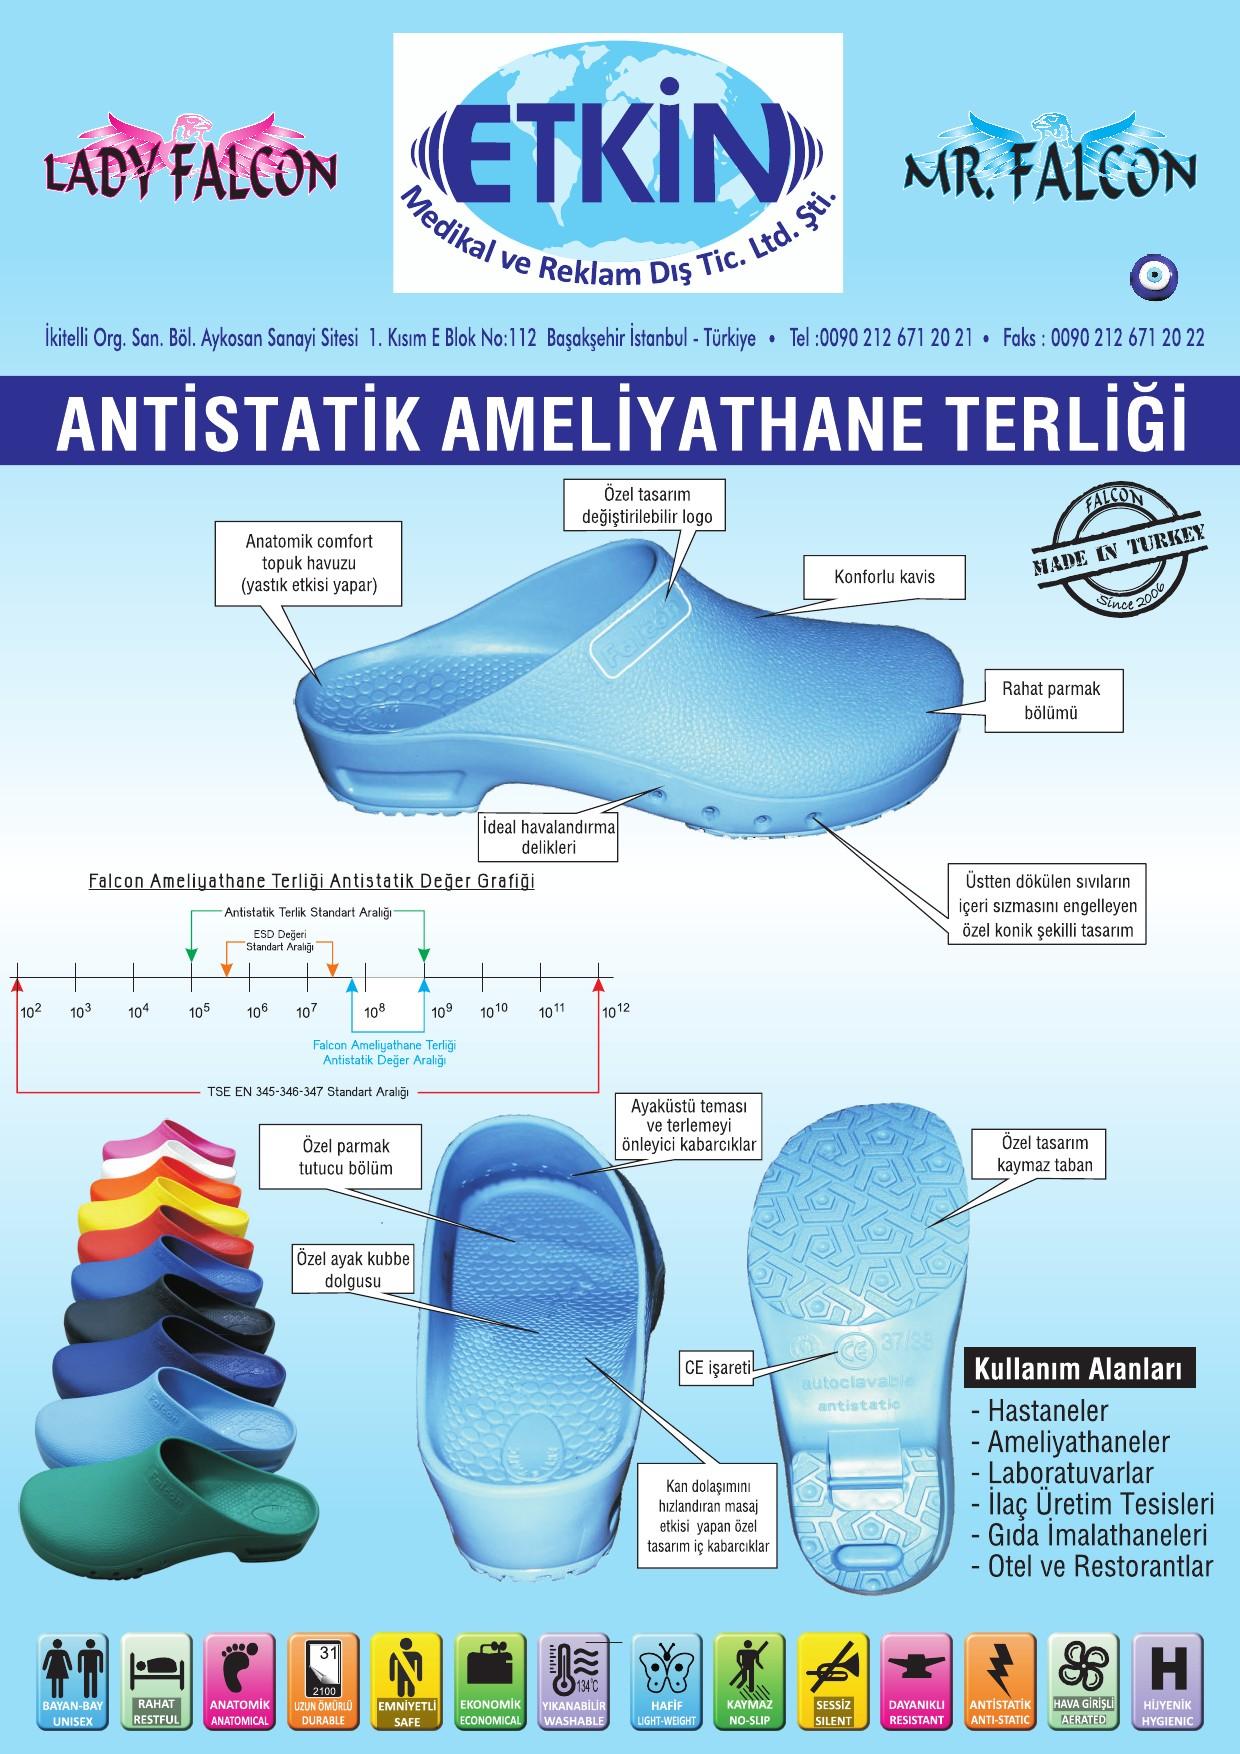 Antistatik Ameliyathane Terlikleri